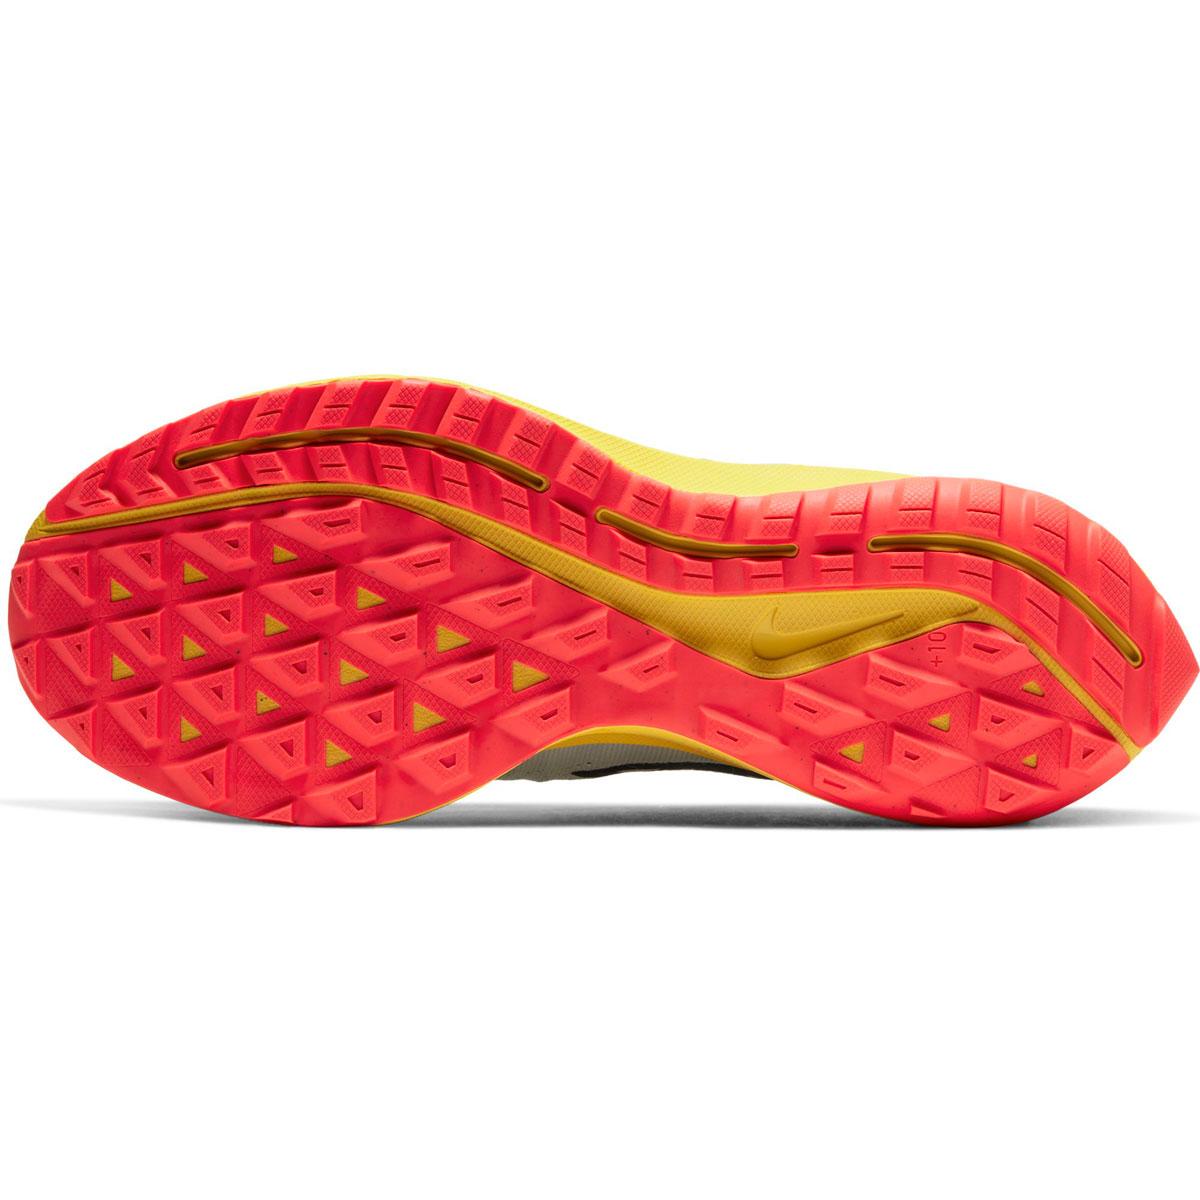 Men's Nike Air Zoom Pegasus 36 Trail Running Shoe - Color: Aura/Blackened Blue/Light Armory (Regular Width) - Size: 6, Aura/Blackened Blue/Light Armory, large, image 3